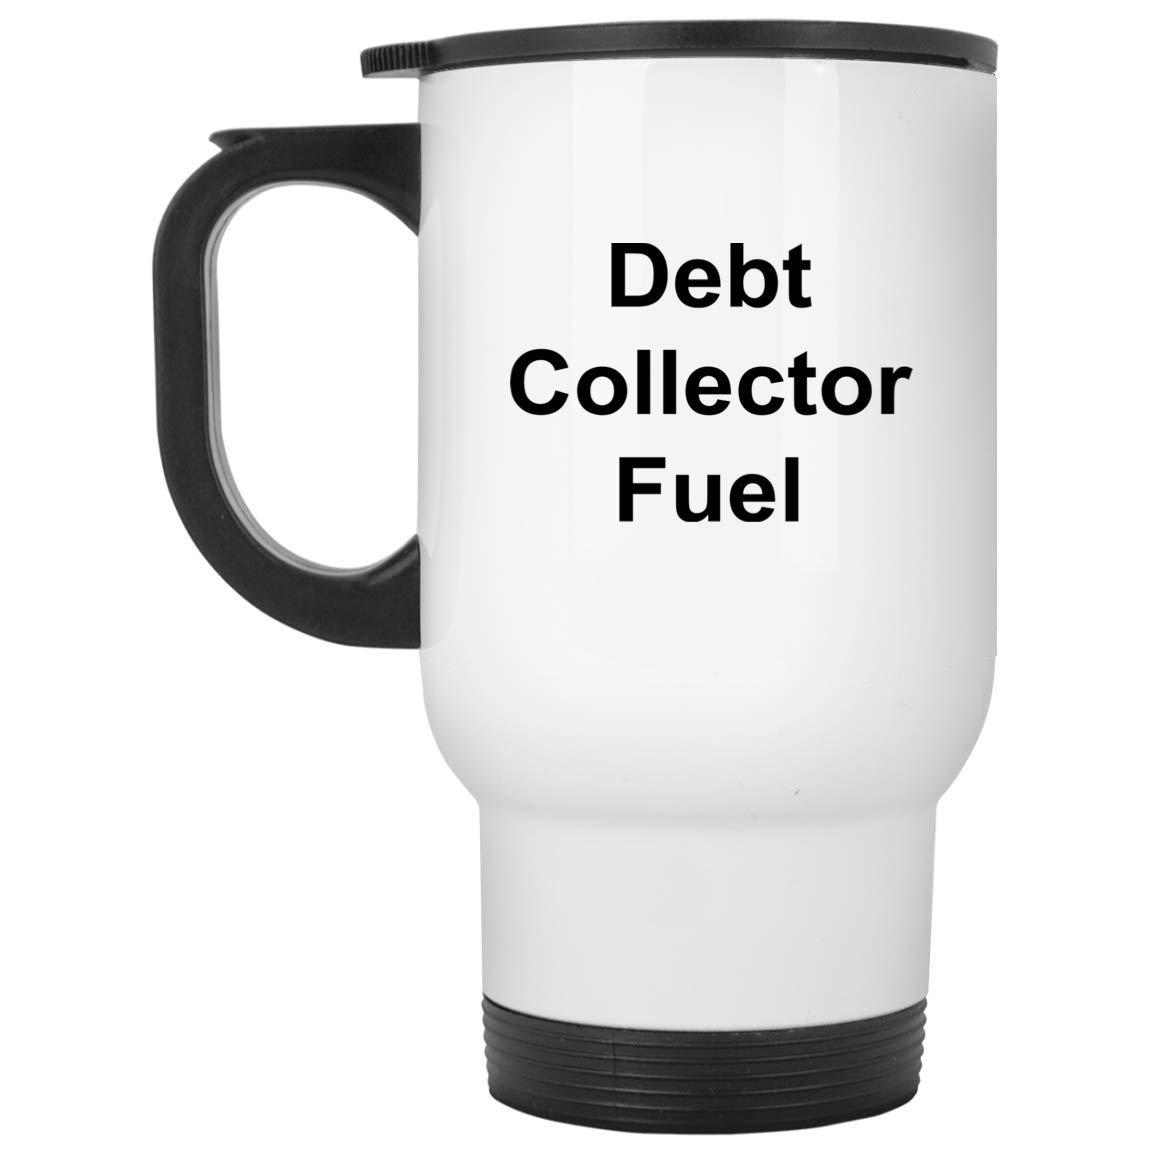 Debt Collector トラベルマグ - 14オンス ホワイトステンレススチール - おもしろノベルティギフトアイデア   B07HPF7BKH